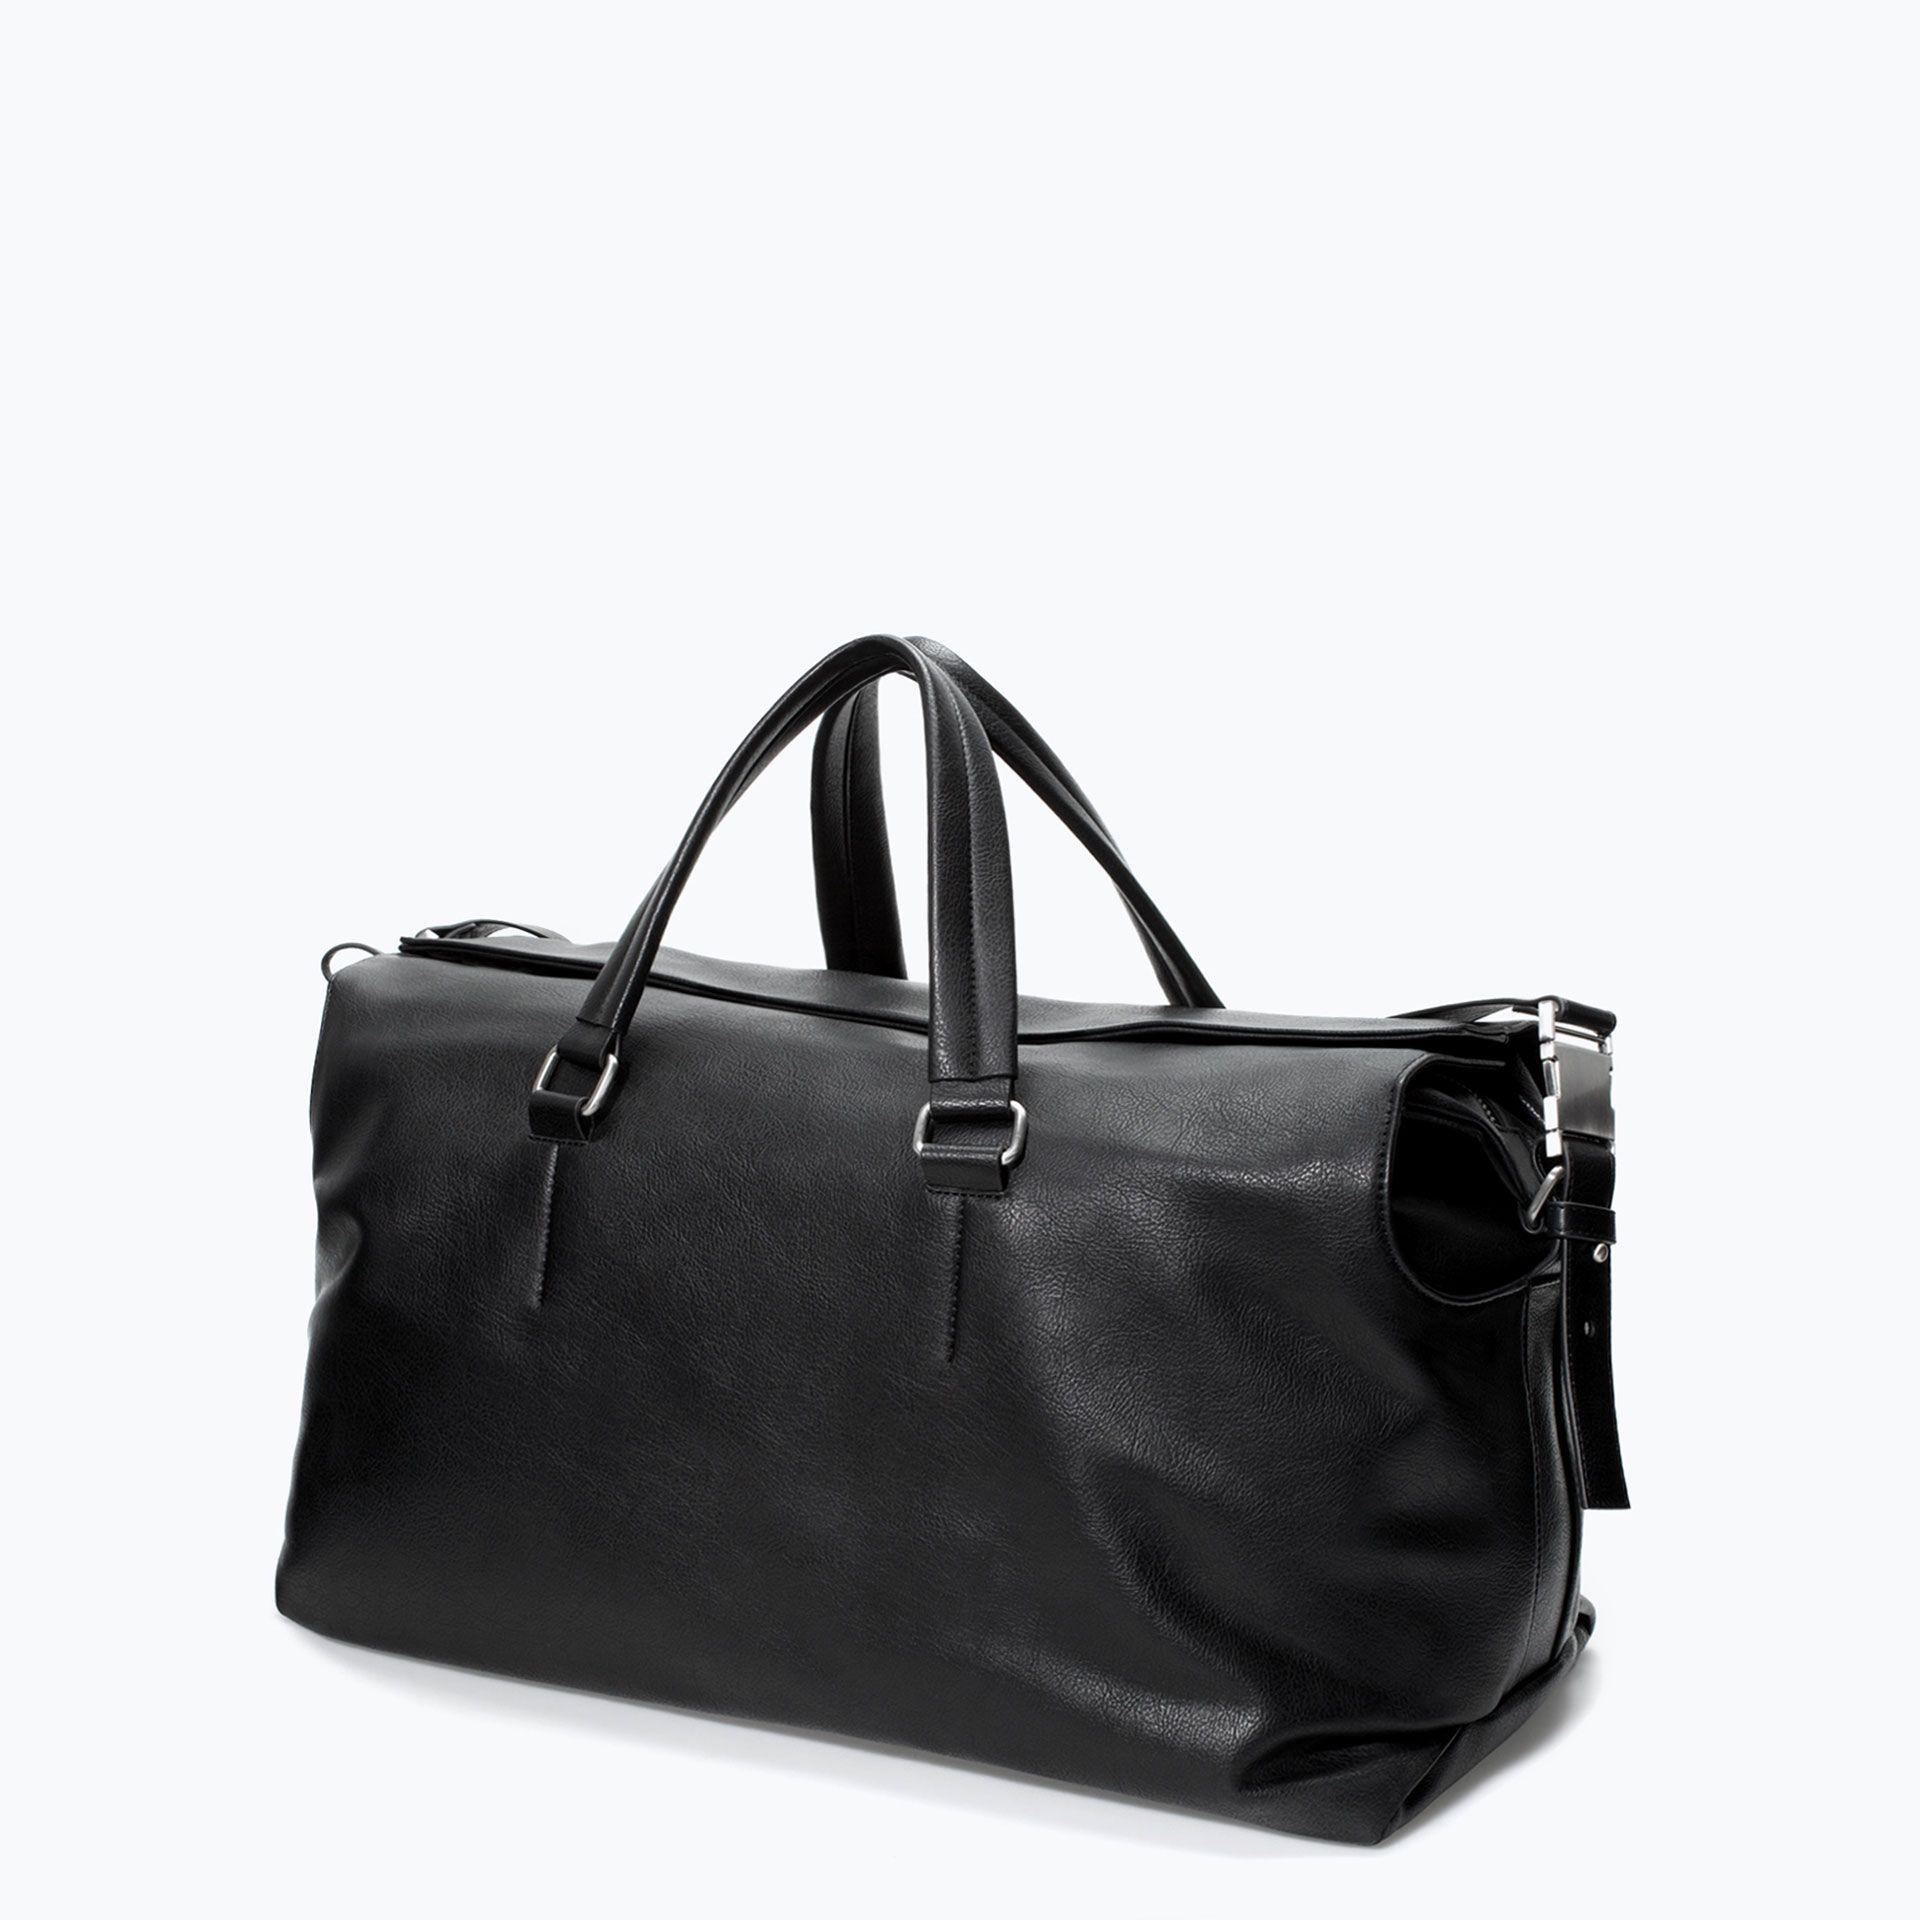 52a08ead58 Zara Gym Bag Zara Man